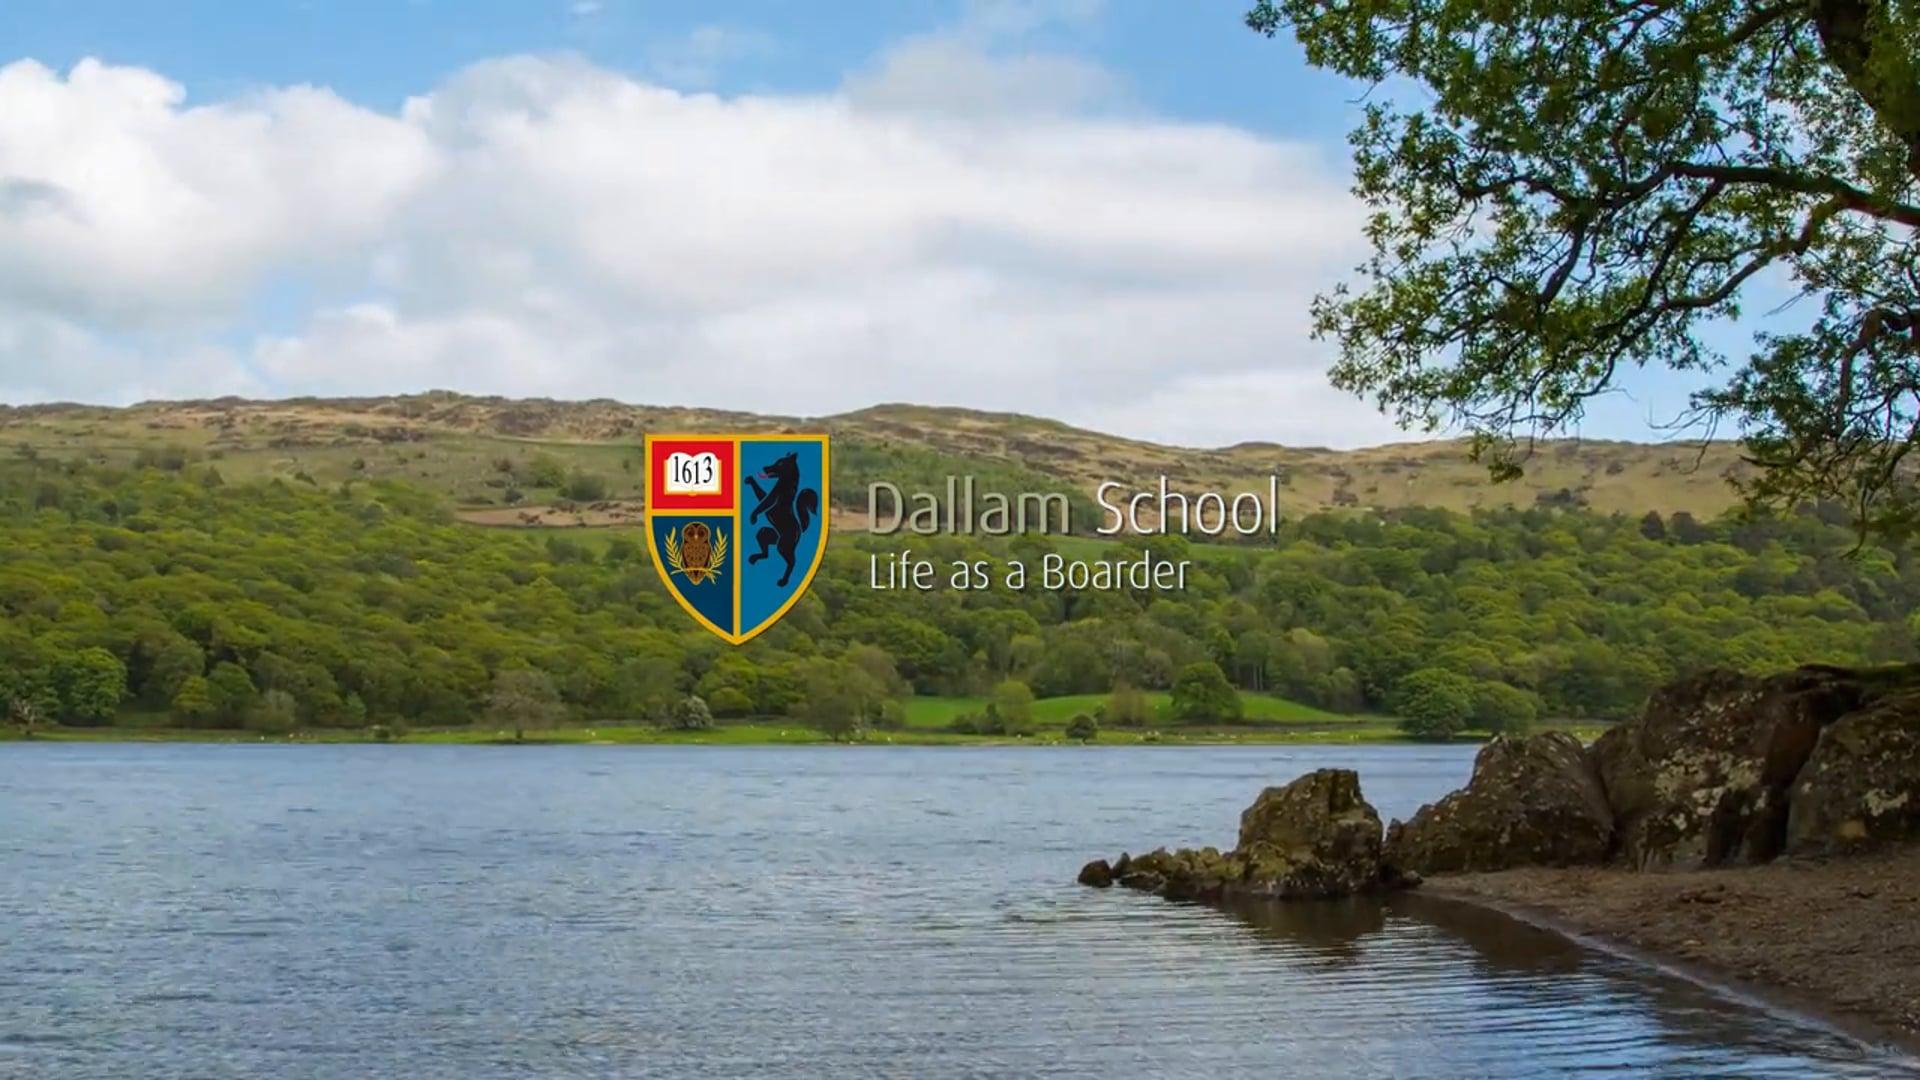 Dallam School - Life as a Boarder